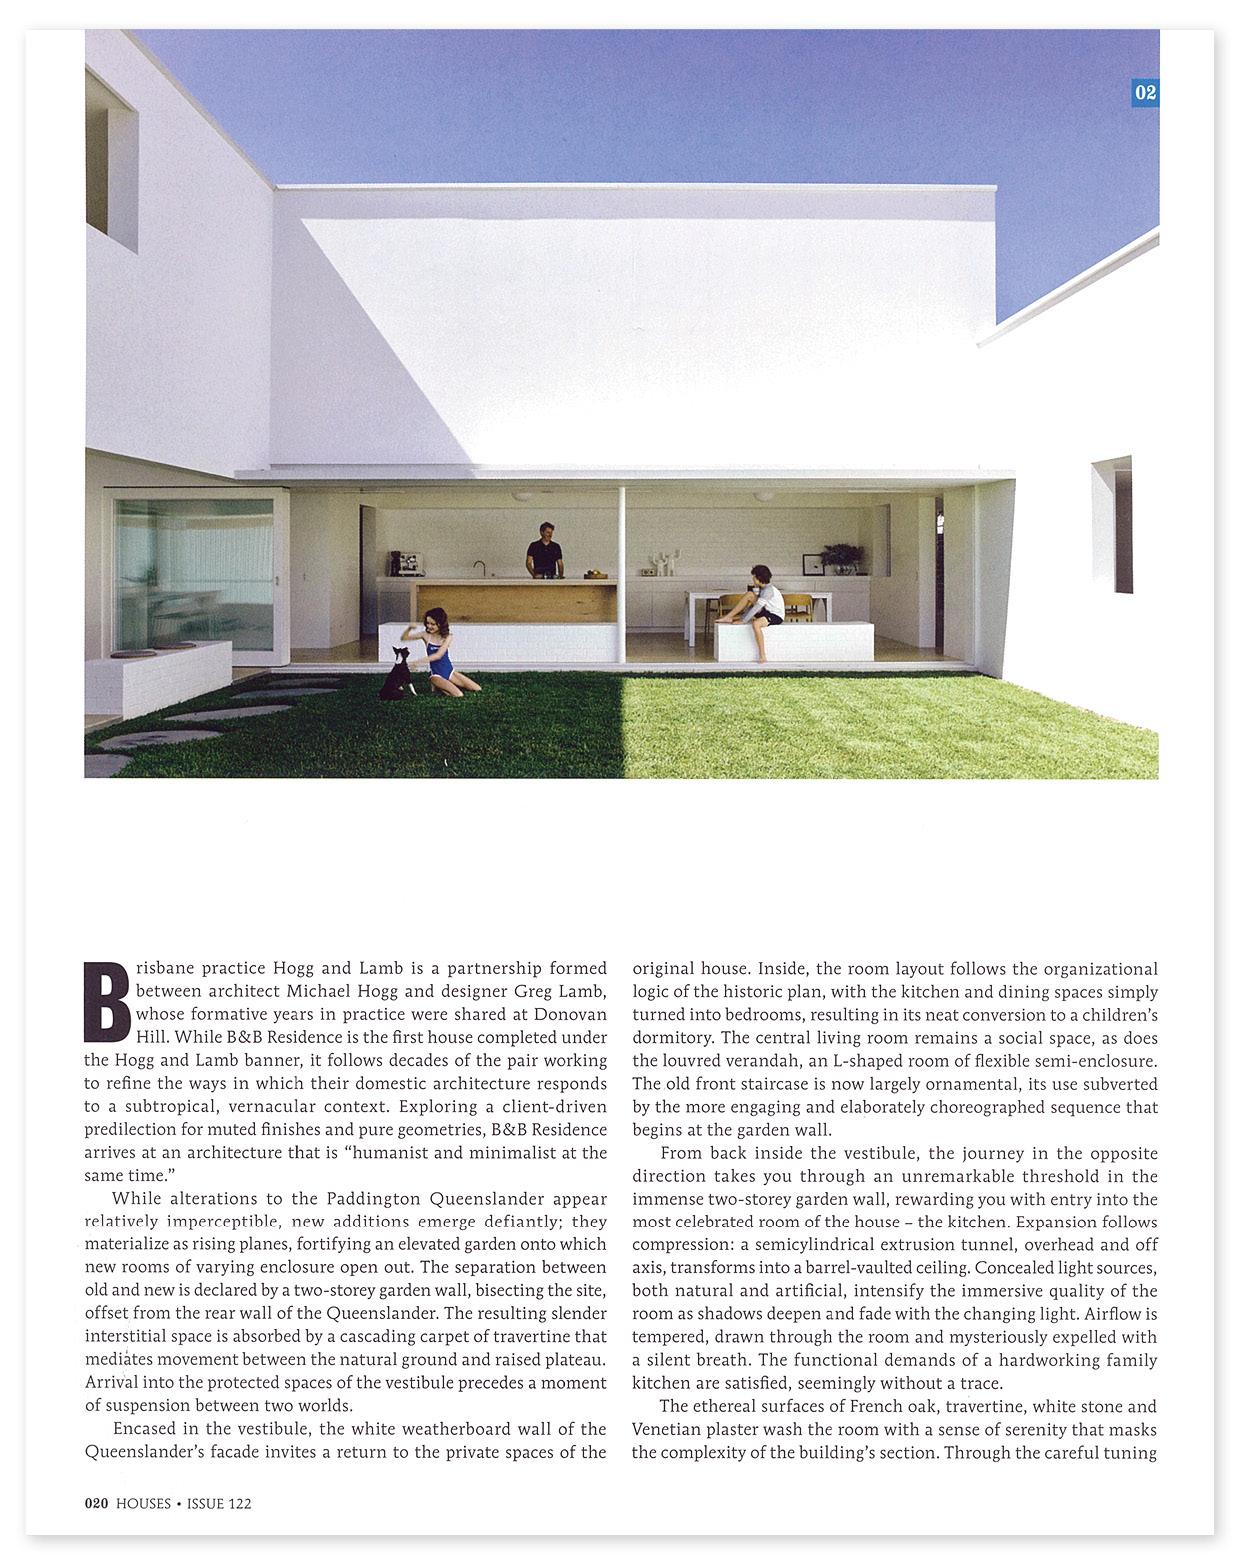 houses_web_2.jpg